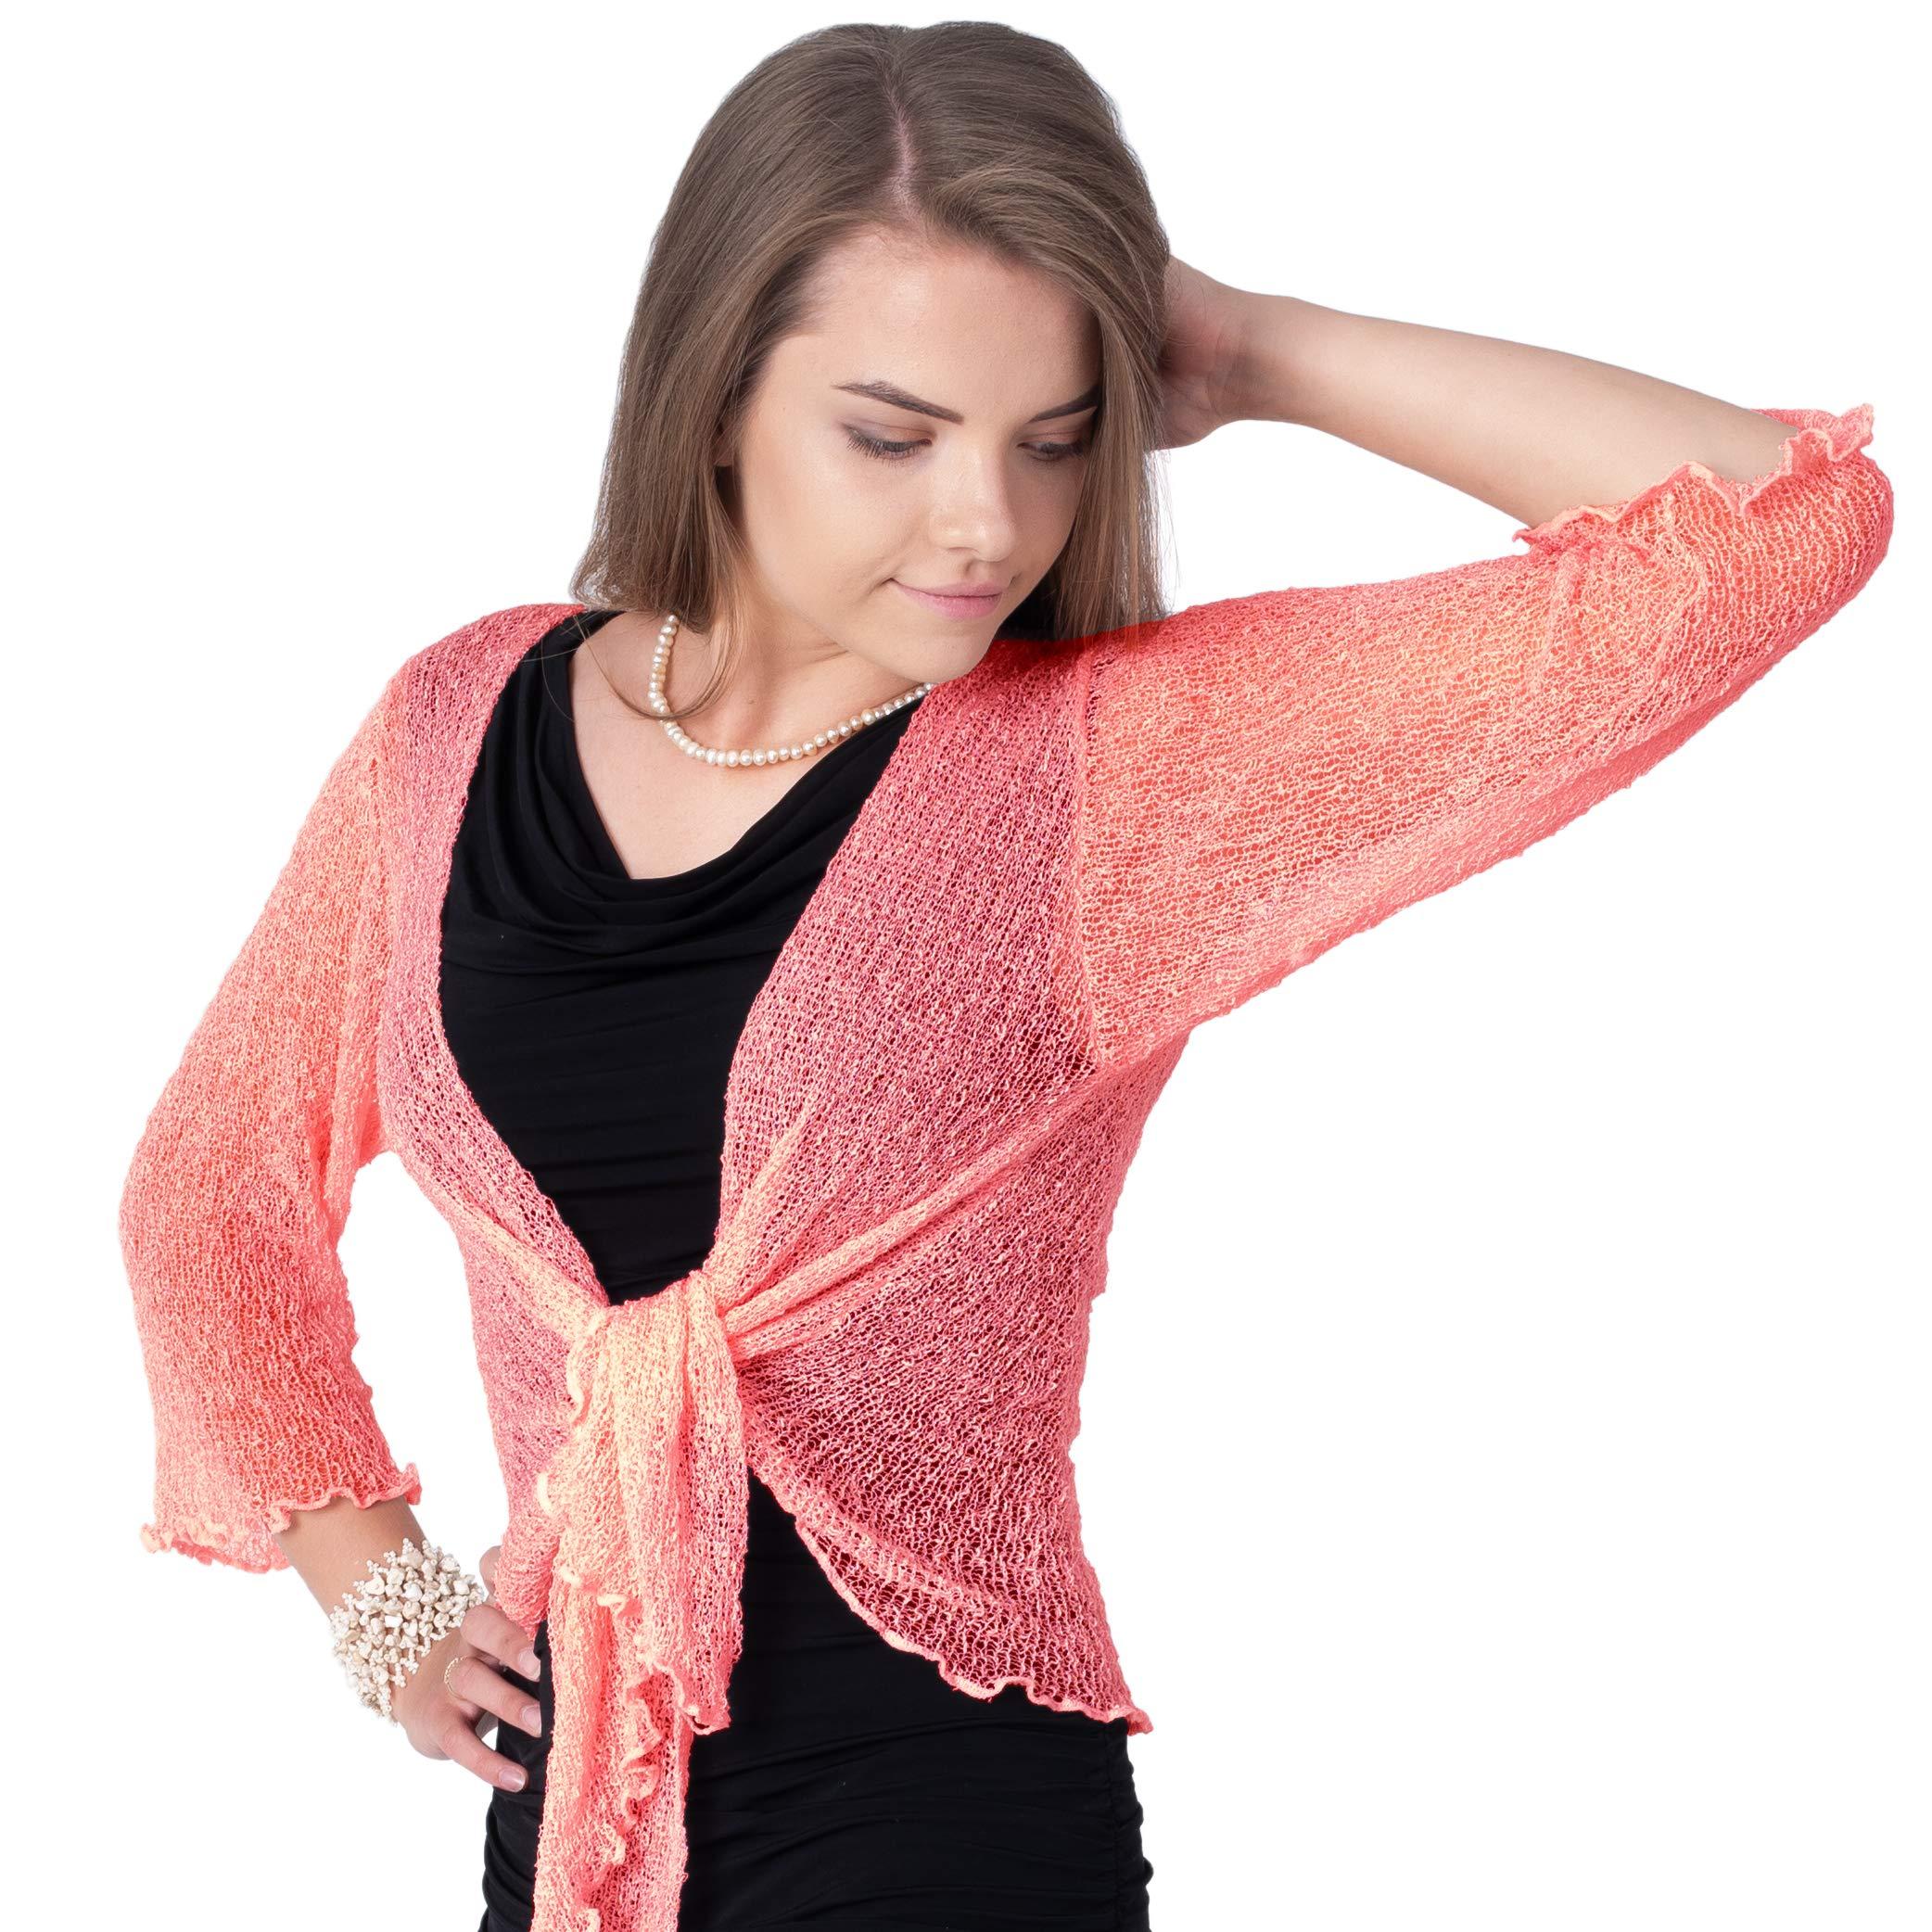 Boho Village Lightweight Cardigans for Women - 3/4 Sleeve Shrugs for Dresses. Dark Pink/Salmon Pink Size S-XL by Boho Village (Image #4)